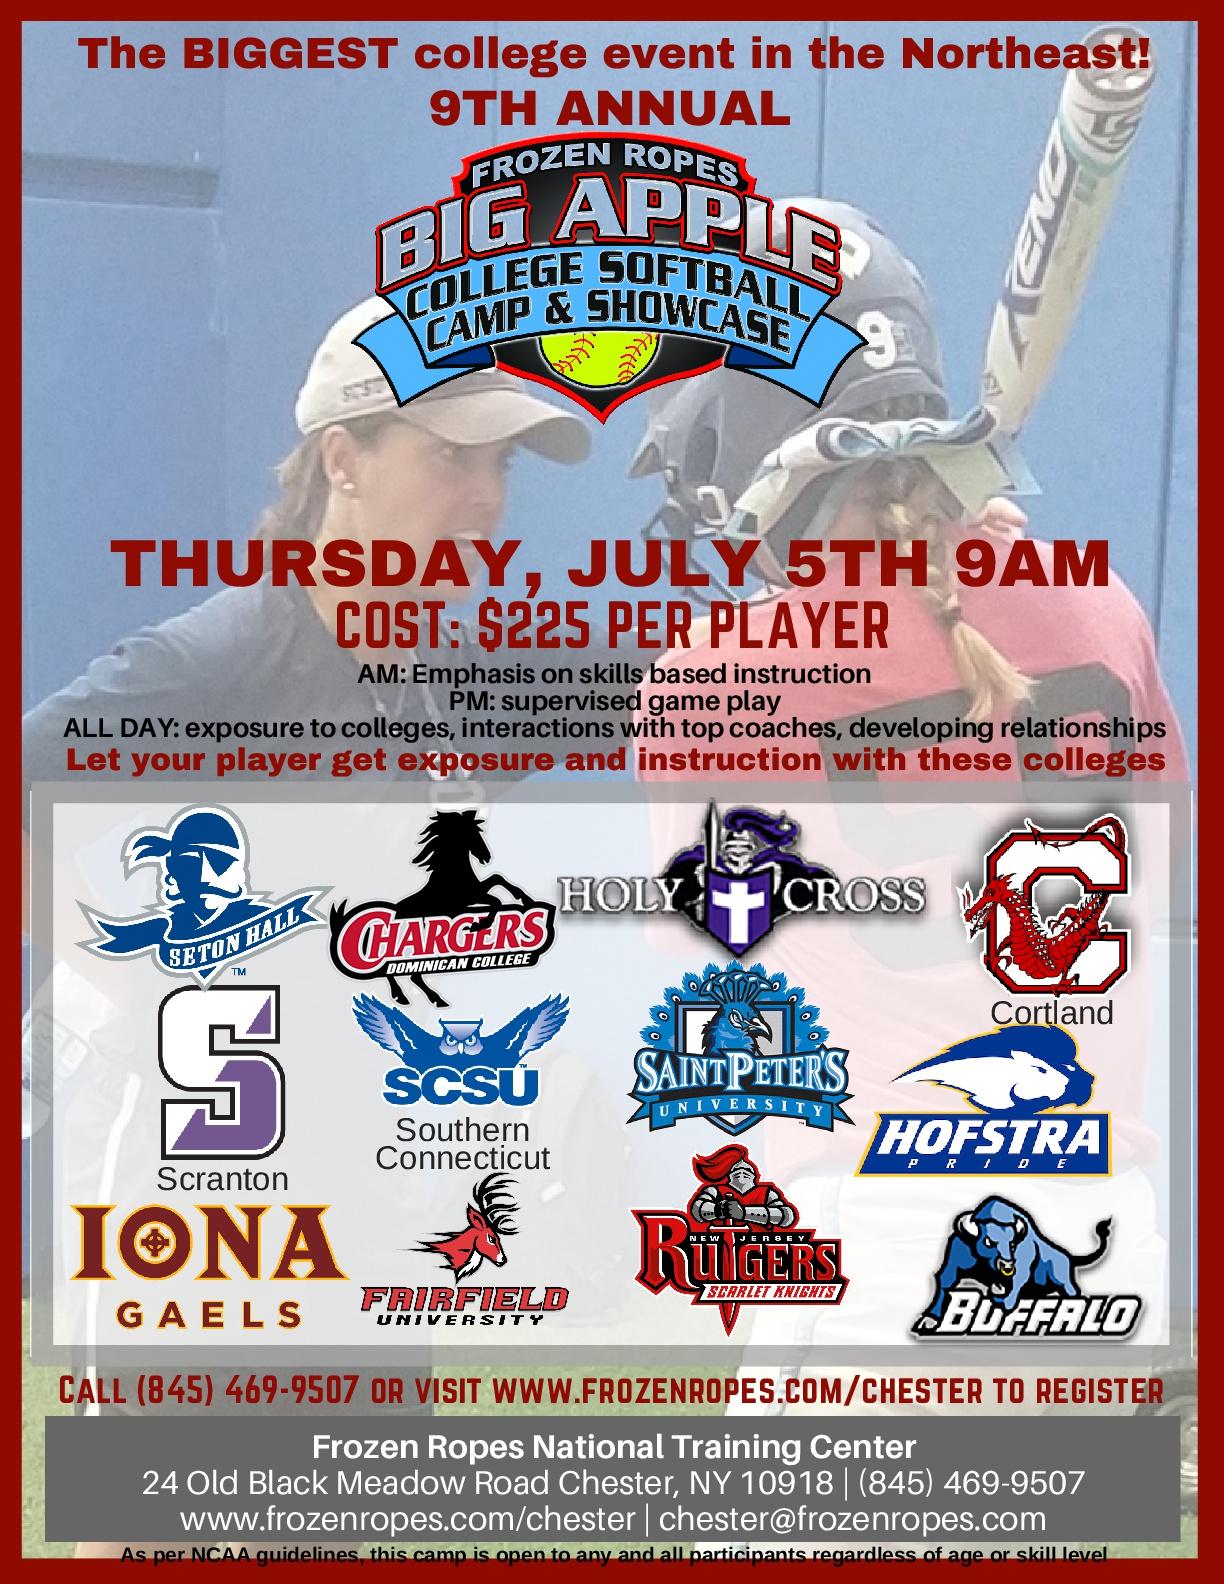 Frozen Ropes Big Apple Softball Show camp & Showcase